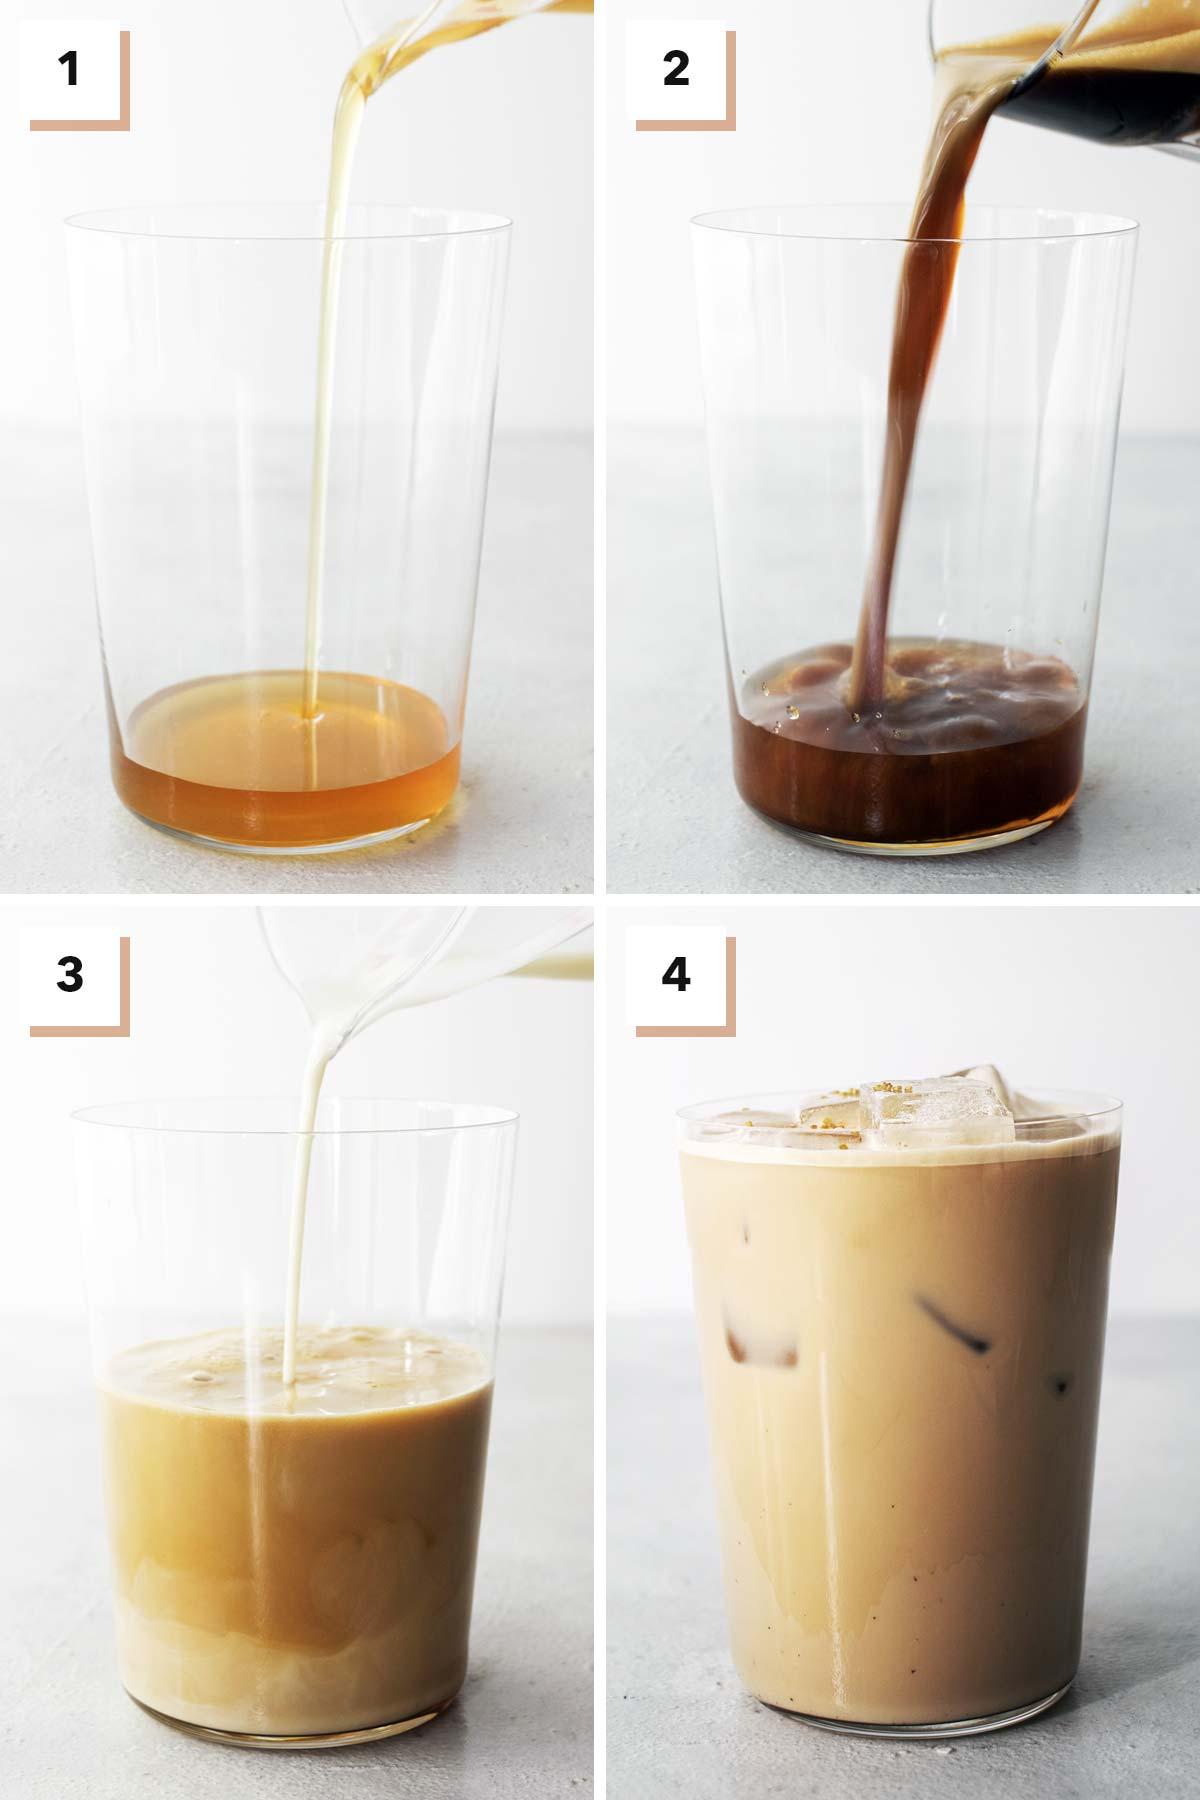 Six photos showing steps to make homemade Starbucks Iced Honey Oatmilk Latte.